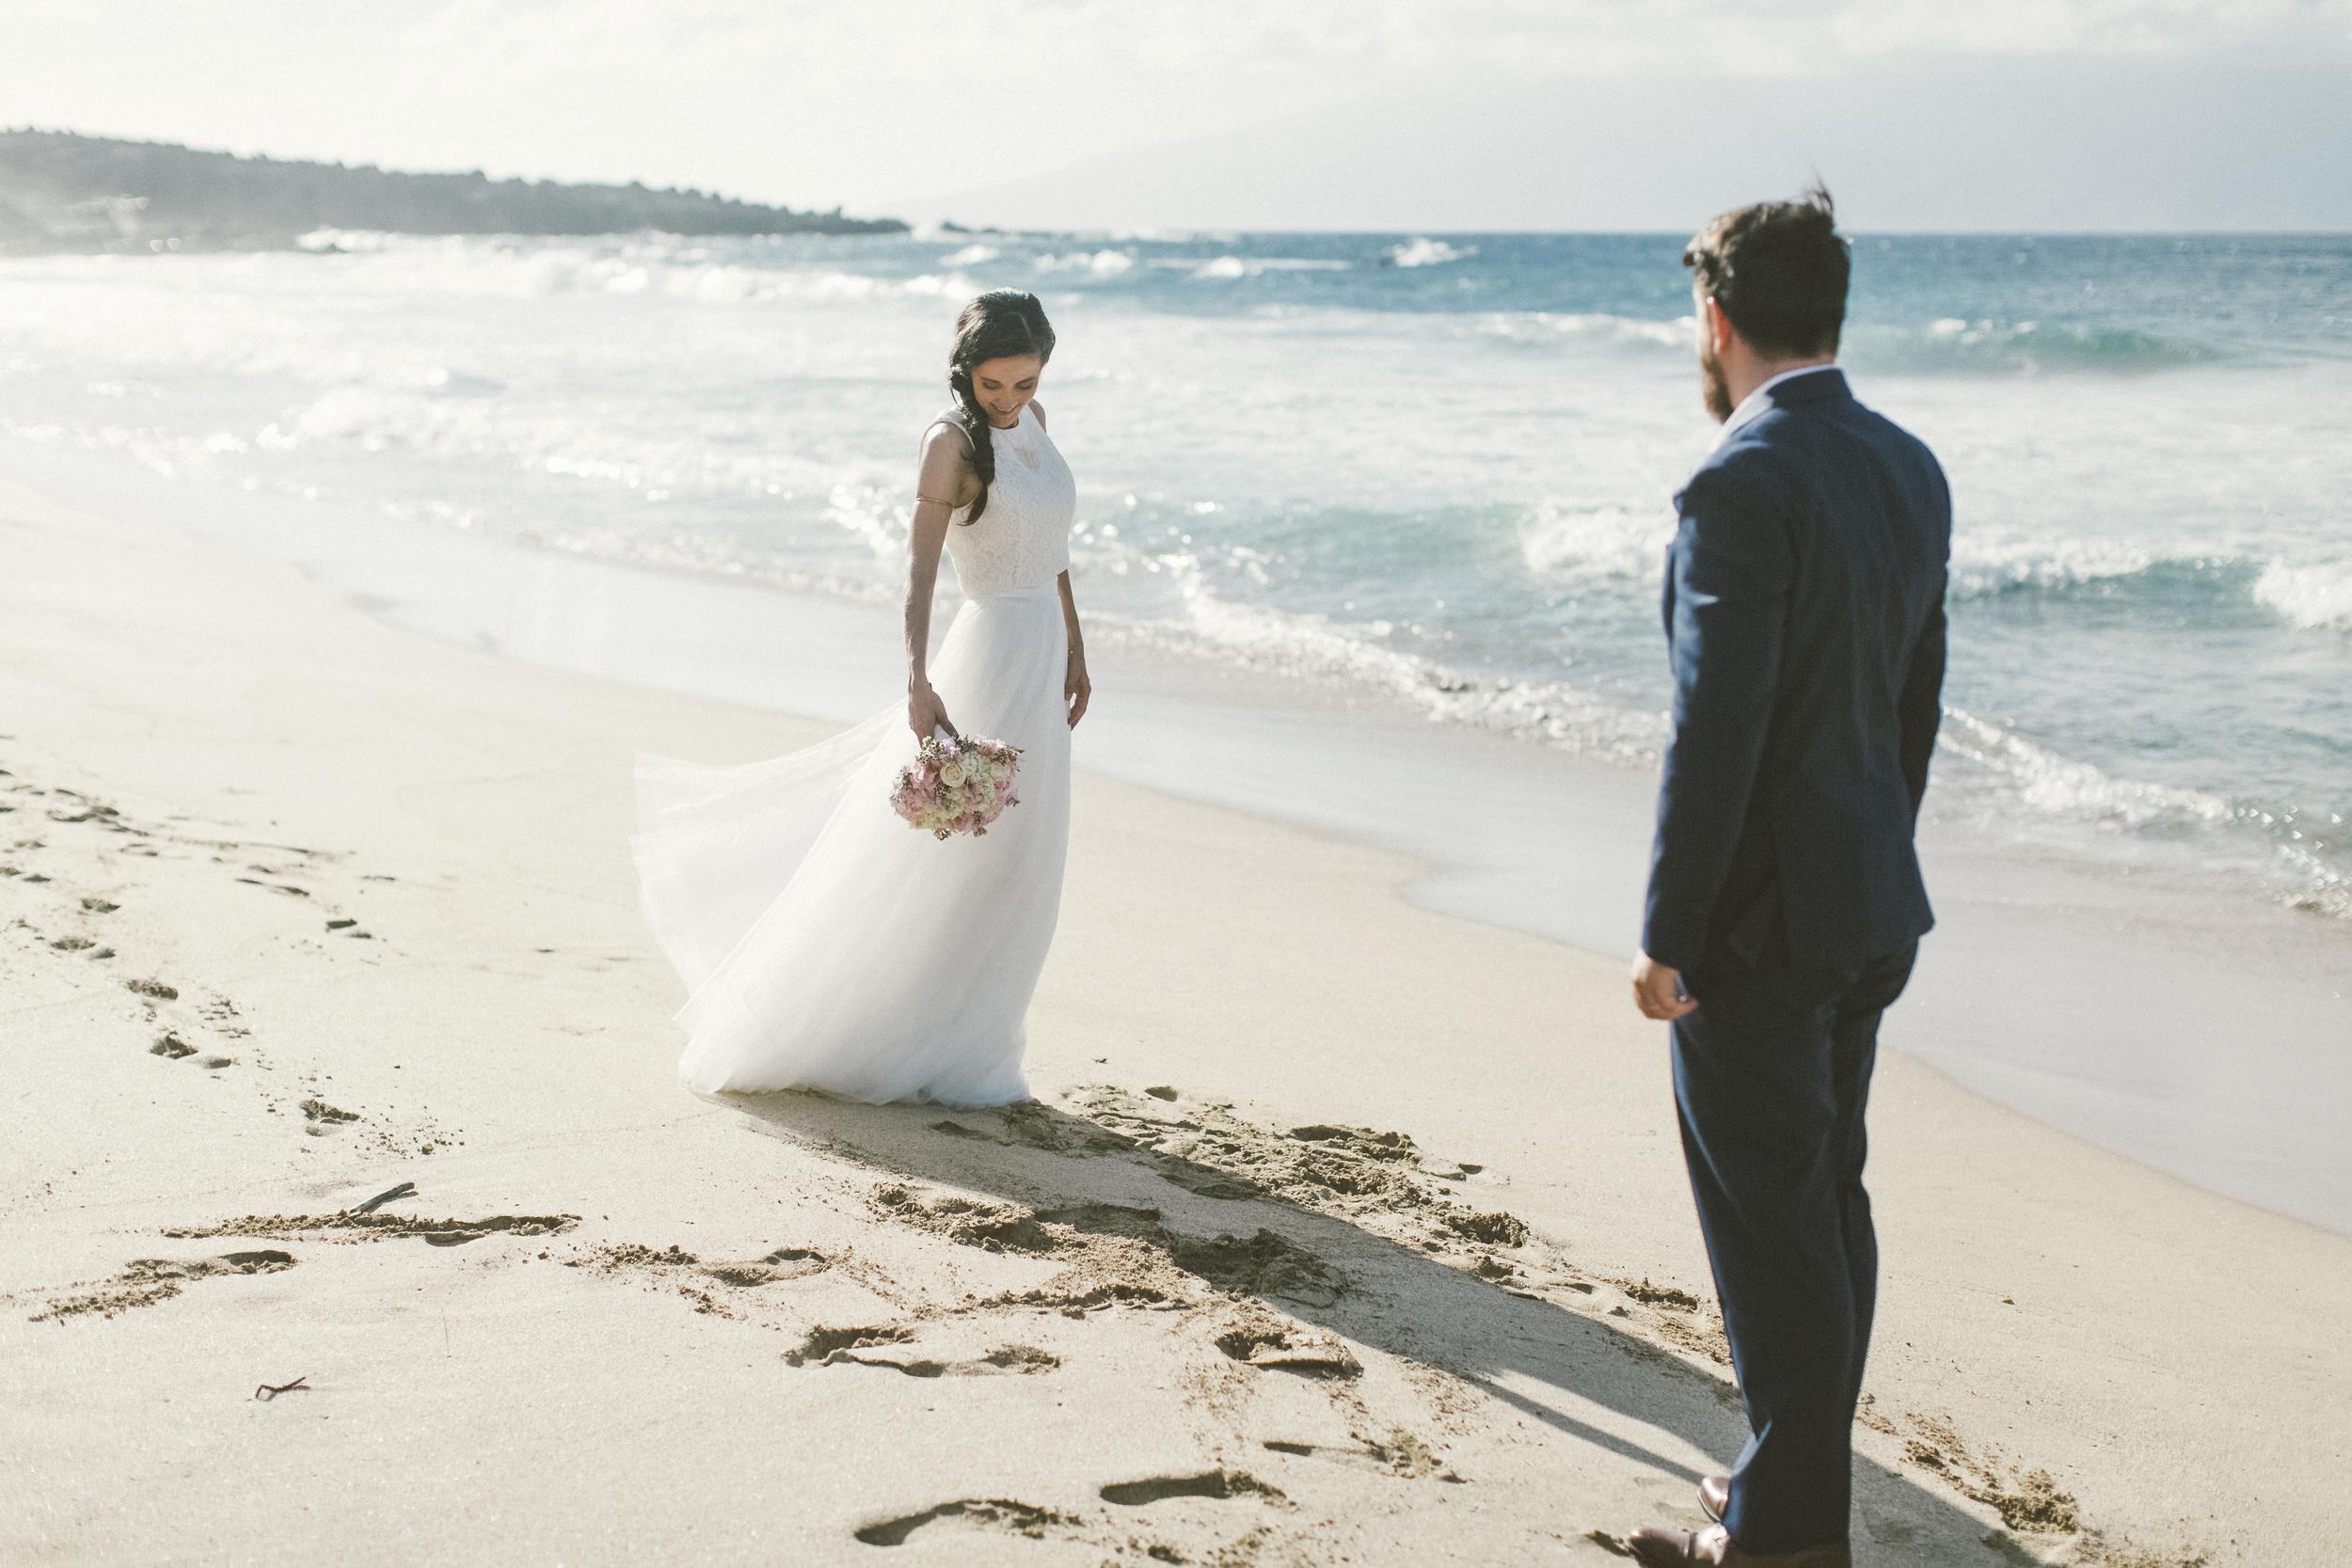 angie-diaz-photography-maui-wedding-ironwoods-beach-31.jpg